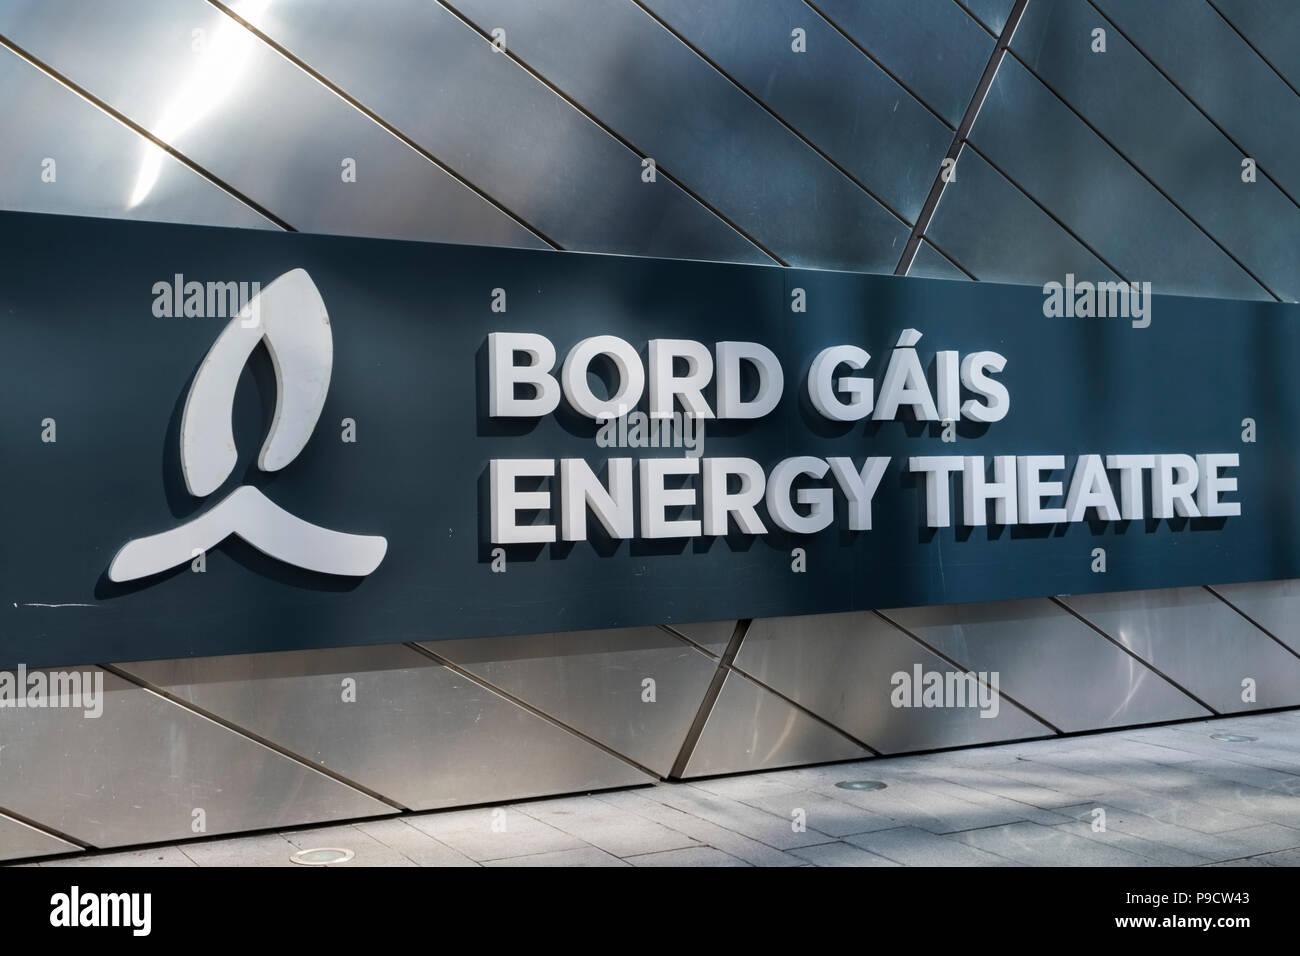 Bord Gais Energy Theatre (Grand Canal Theatre) logo, Dublin, Ireland, Europe - Stock Image